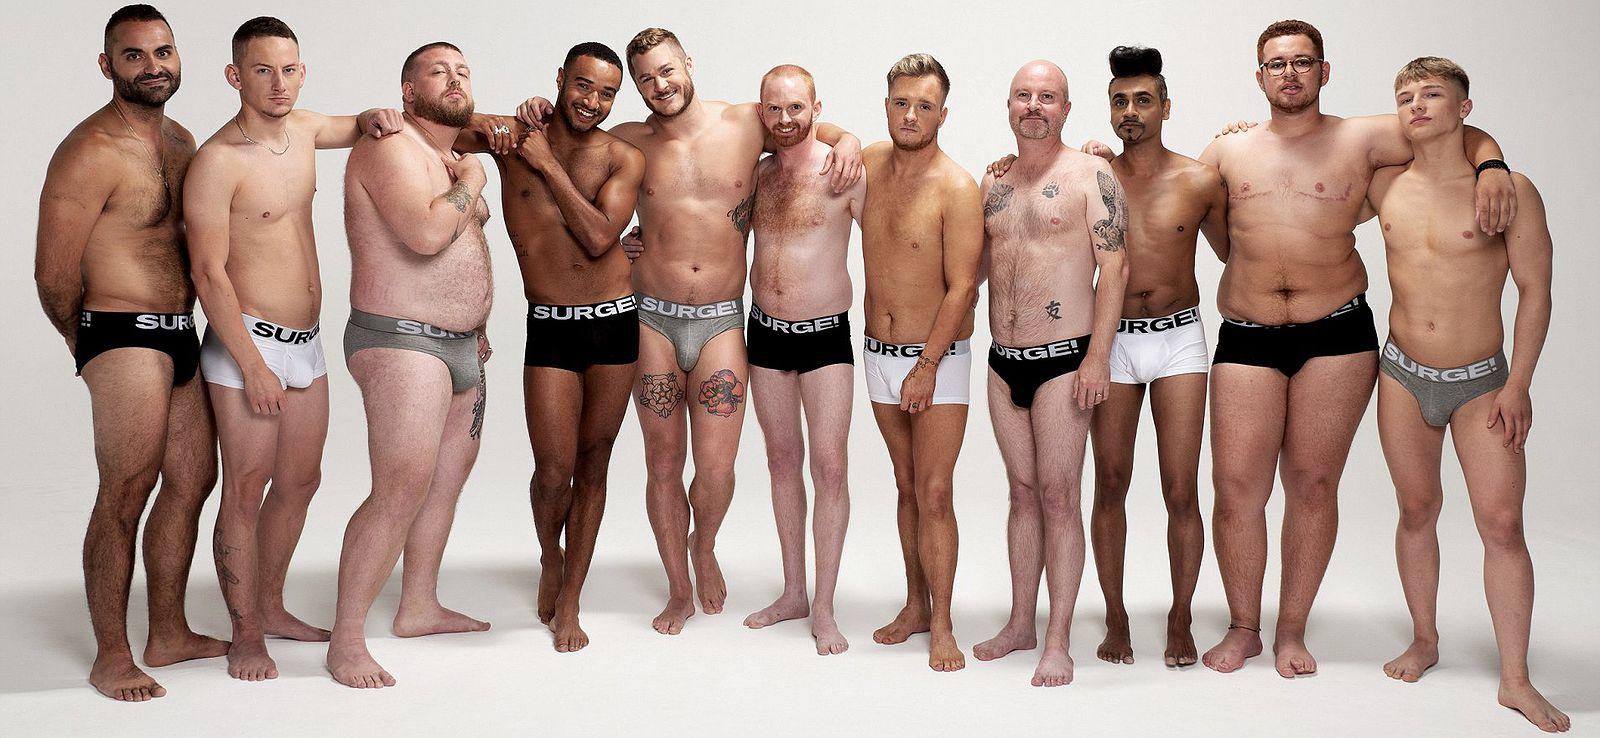 Gay bachelorette party ideas